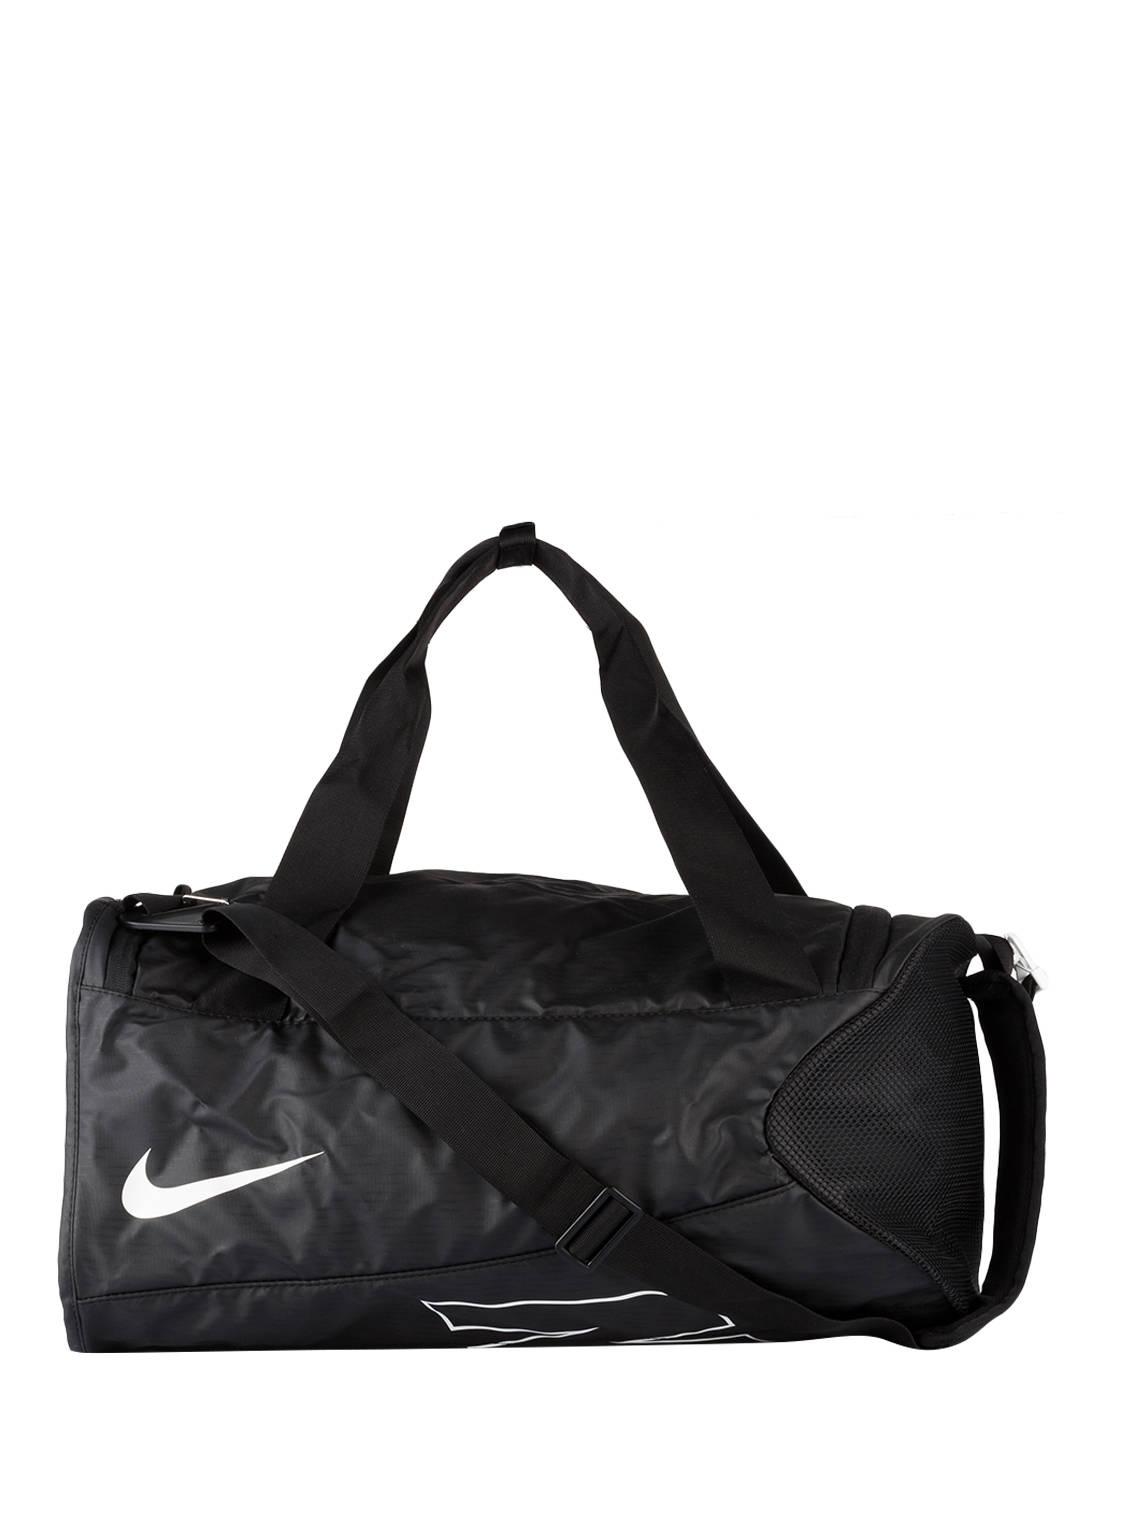 e130e55cde3bc Nike. Nike Sporttasche ALPHA ADAPT CROSSBODY